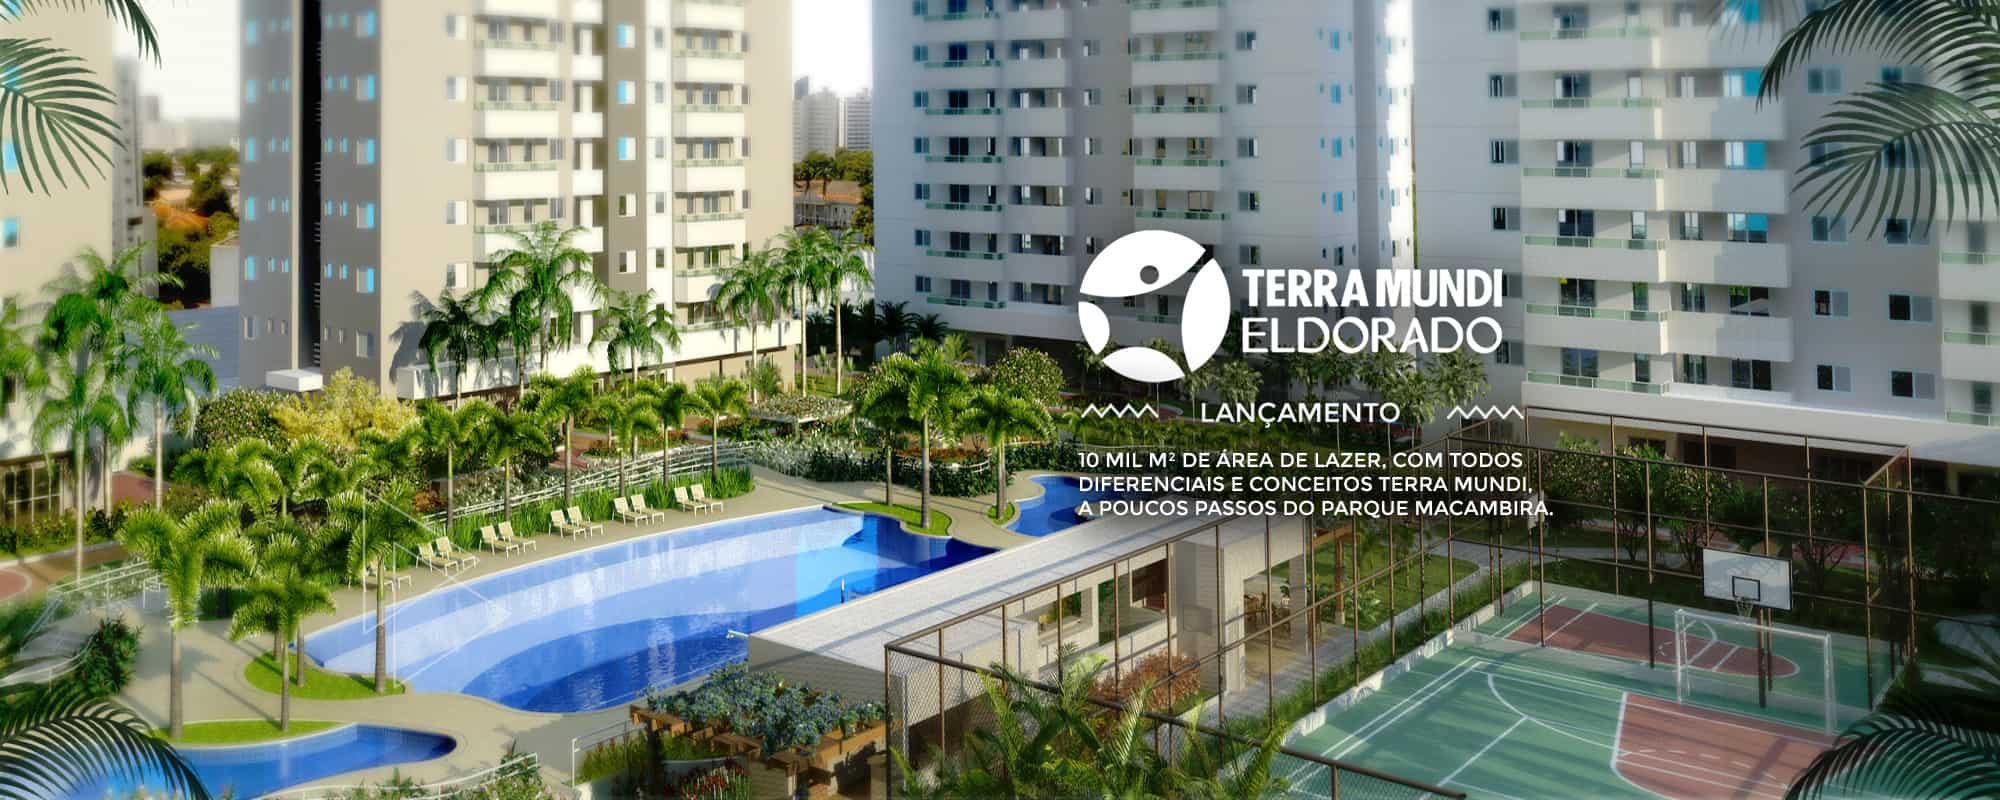 Apartamento Terra Mundi Eldorado - Construtora Newinc